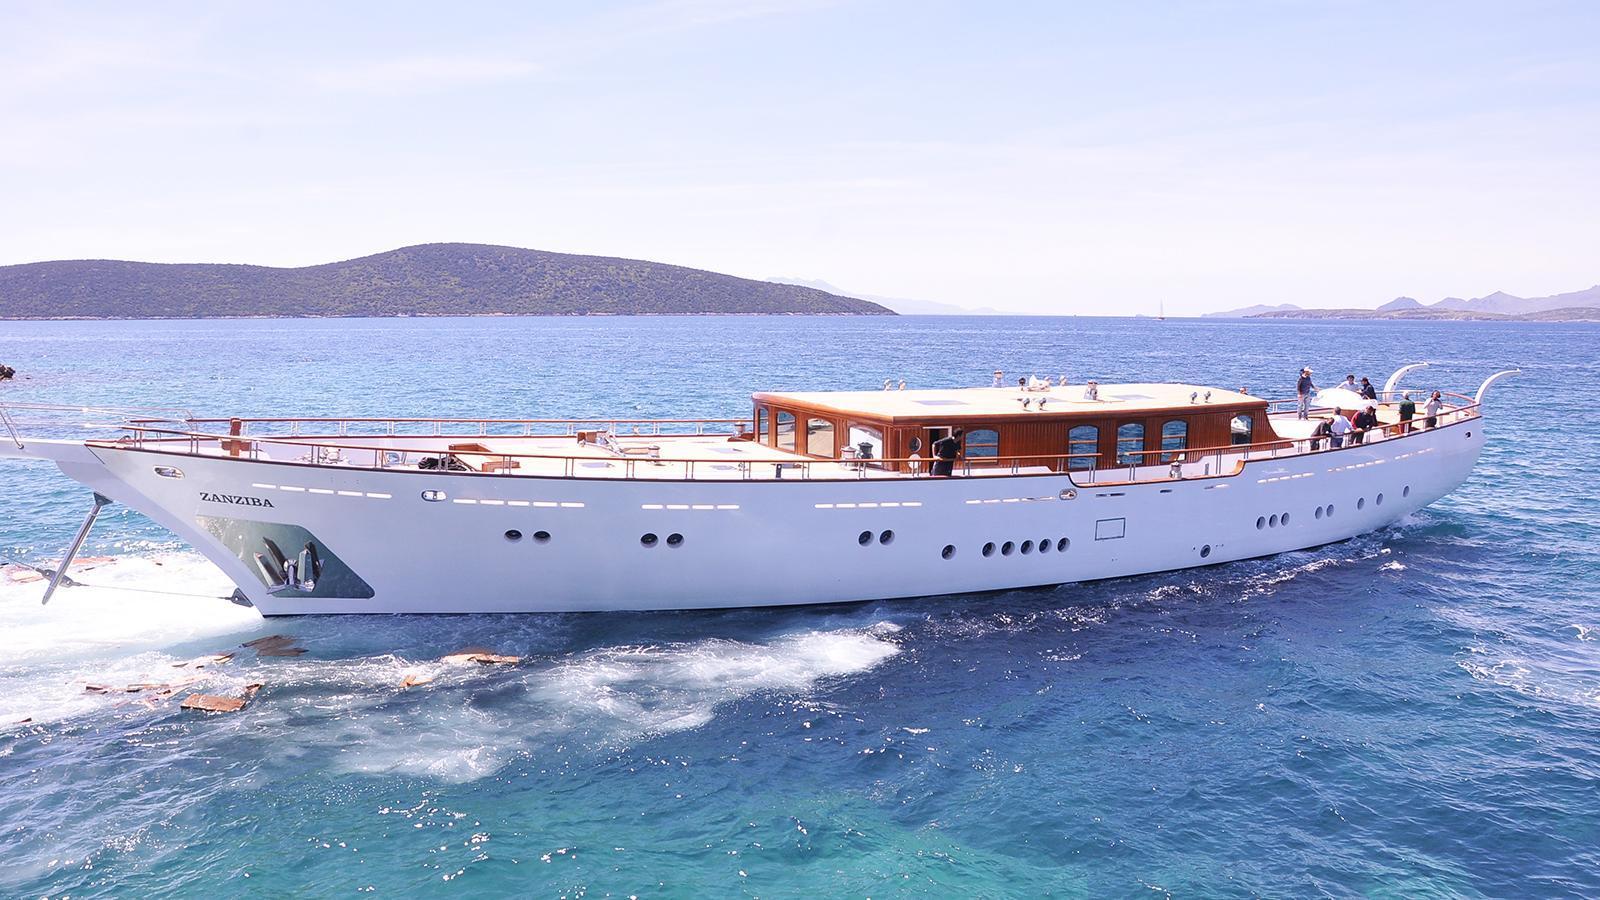 zanziba-sailing-yacht-archipelago-46m-2015-profile-launch